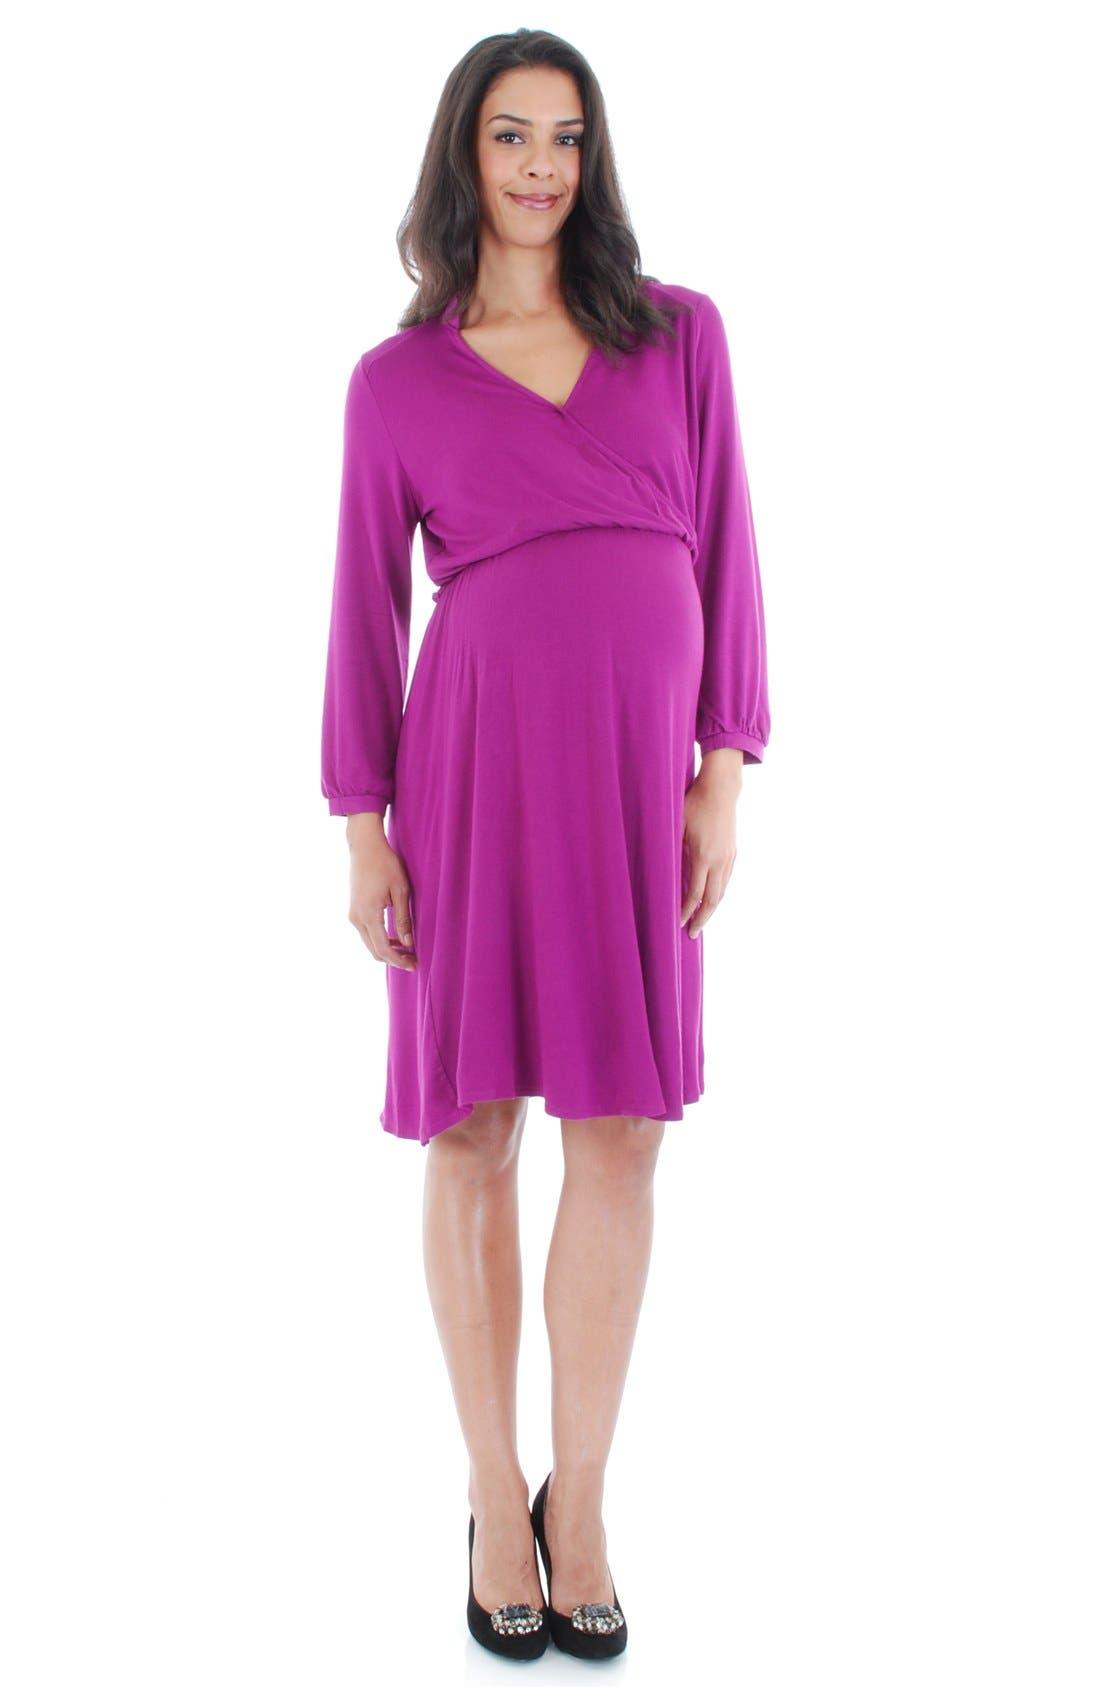 EverlyGrey 'Sicily' Maternity/Nursing Dress